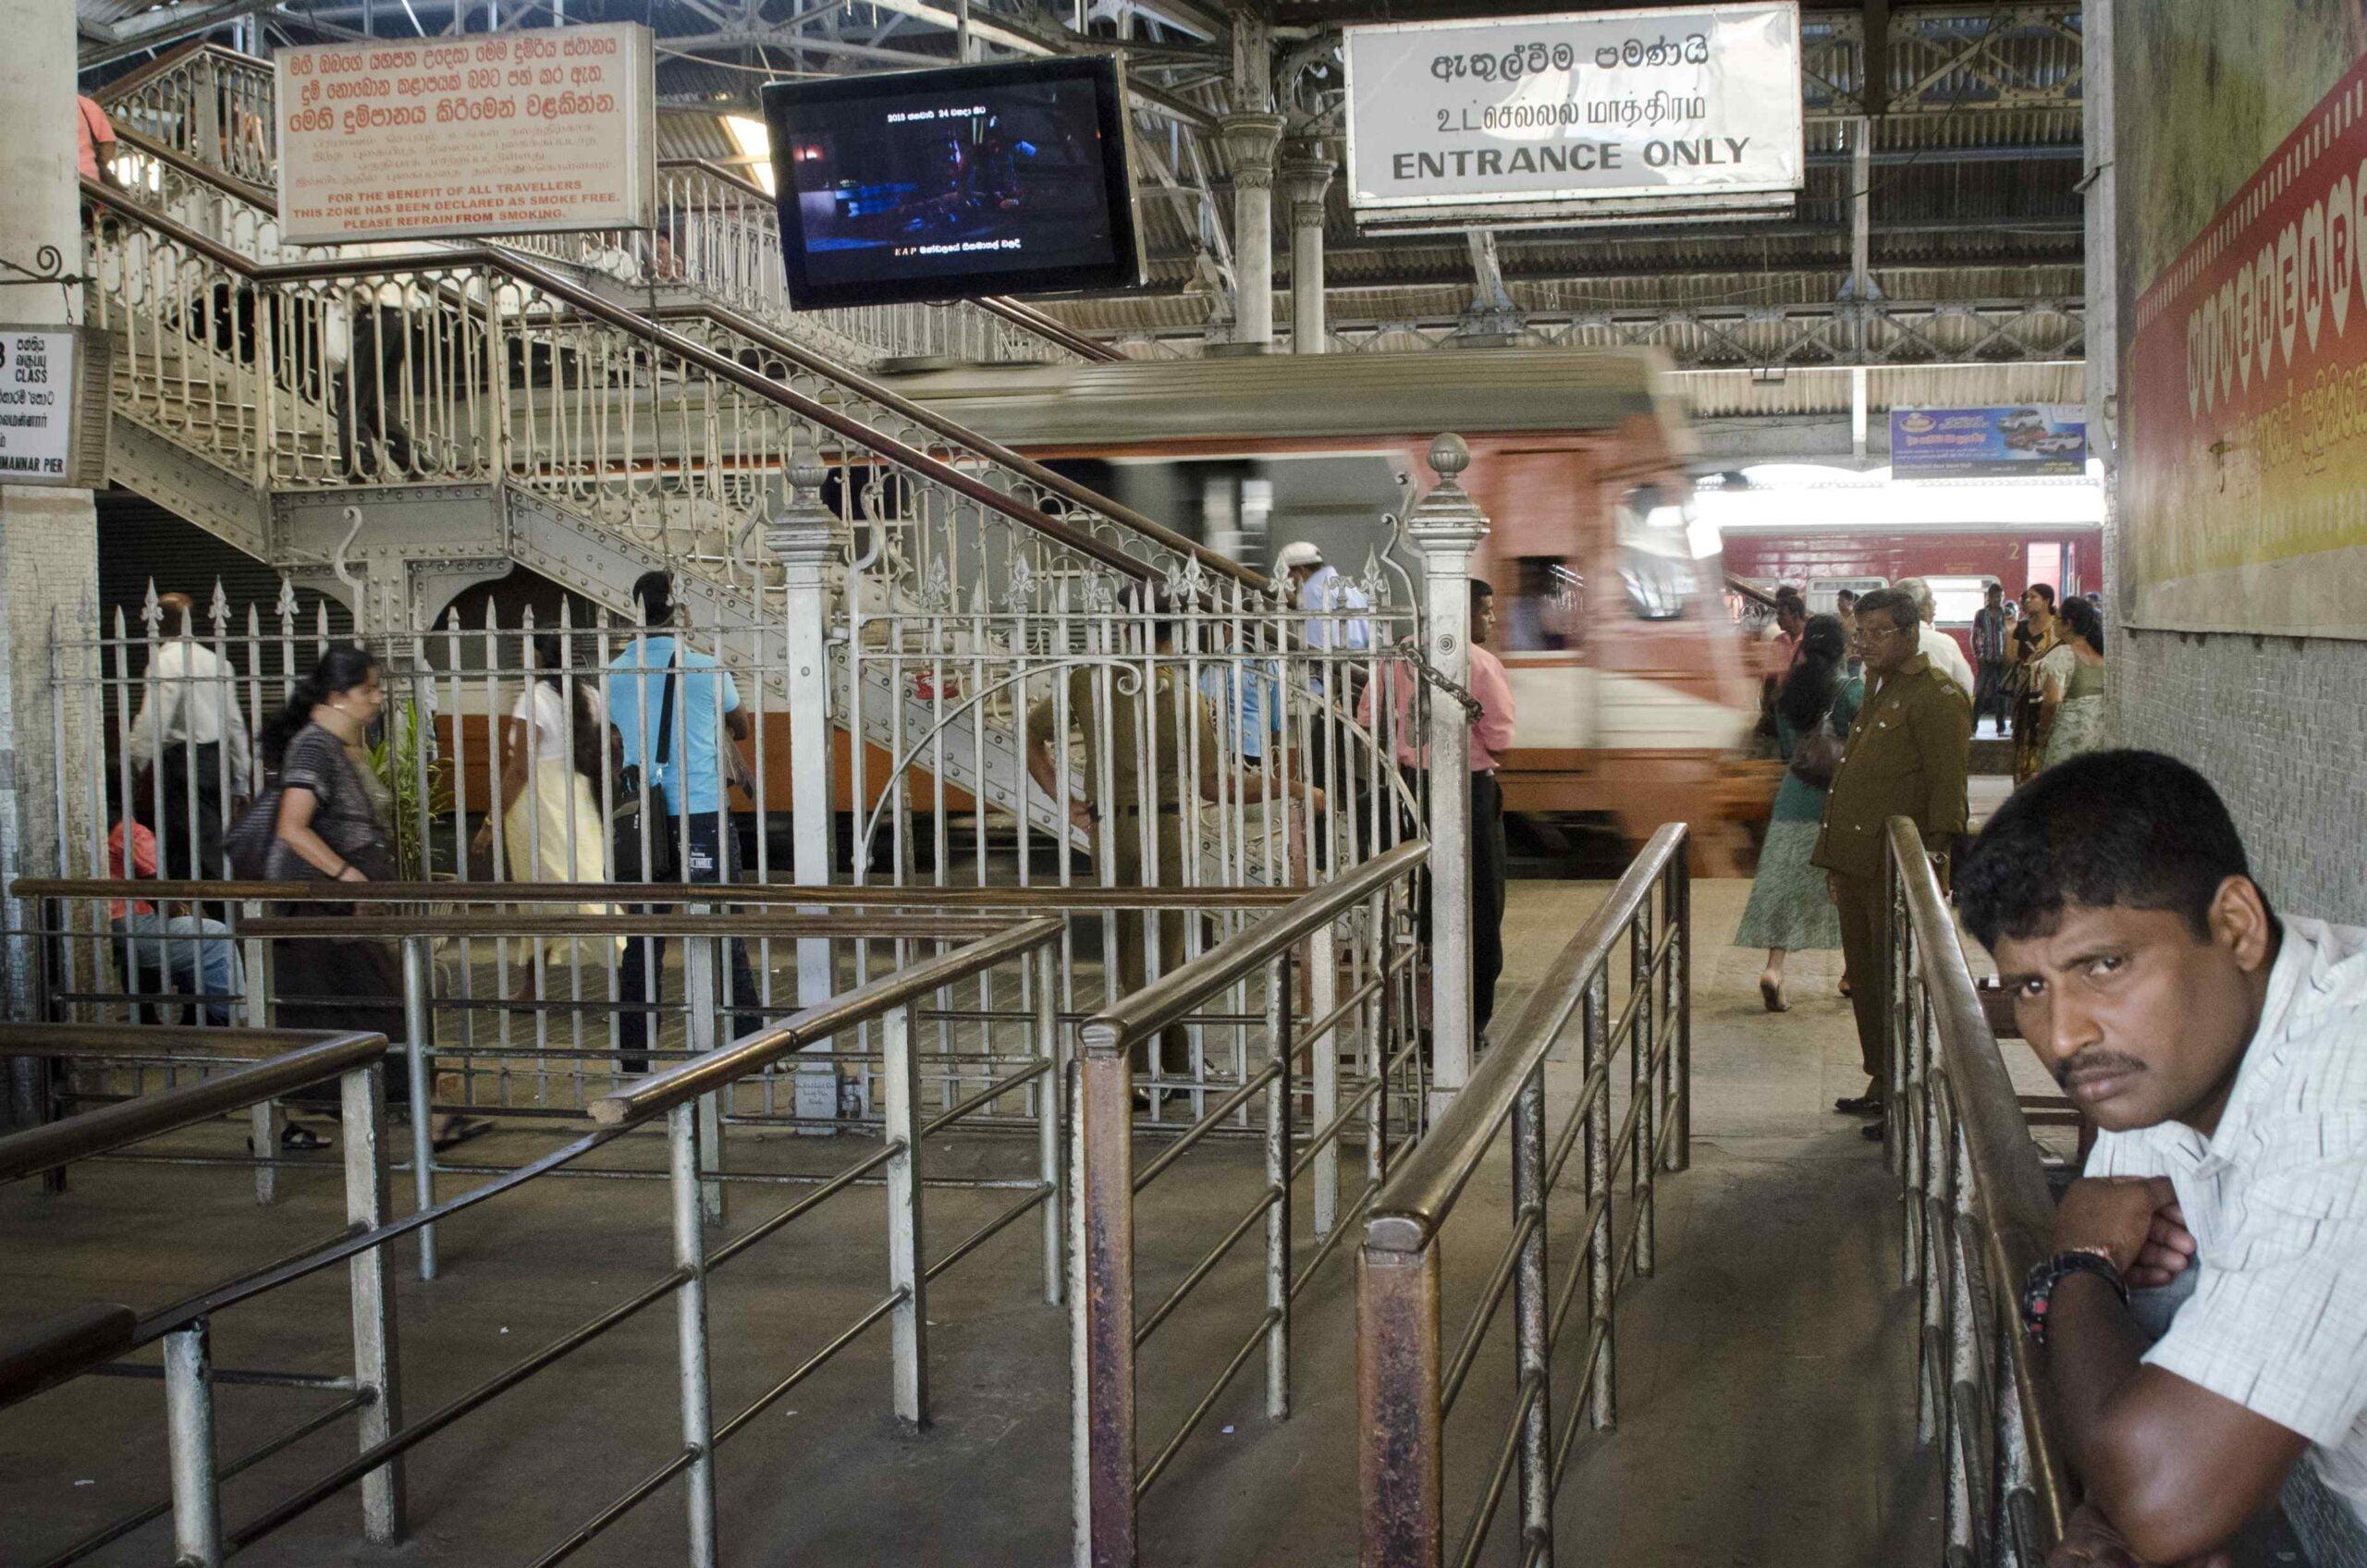 Colombo Travel Blog - The train station in Colombo/La gare de Colombo